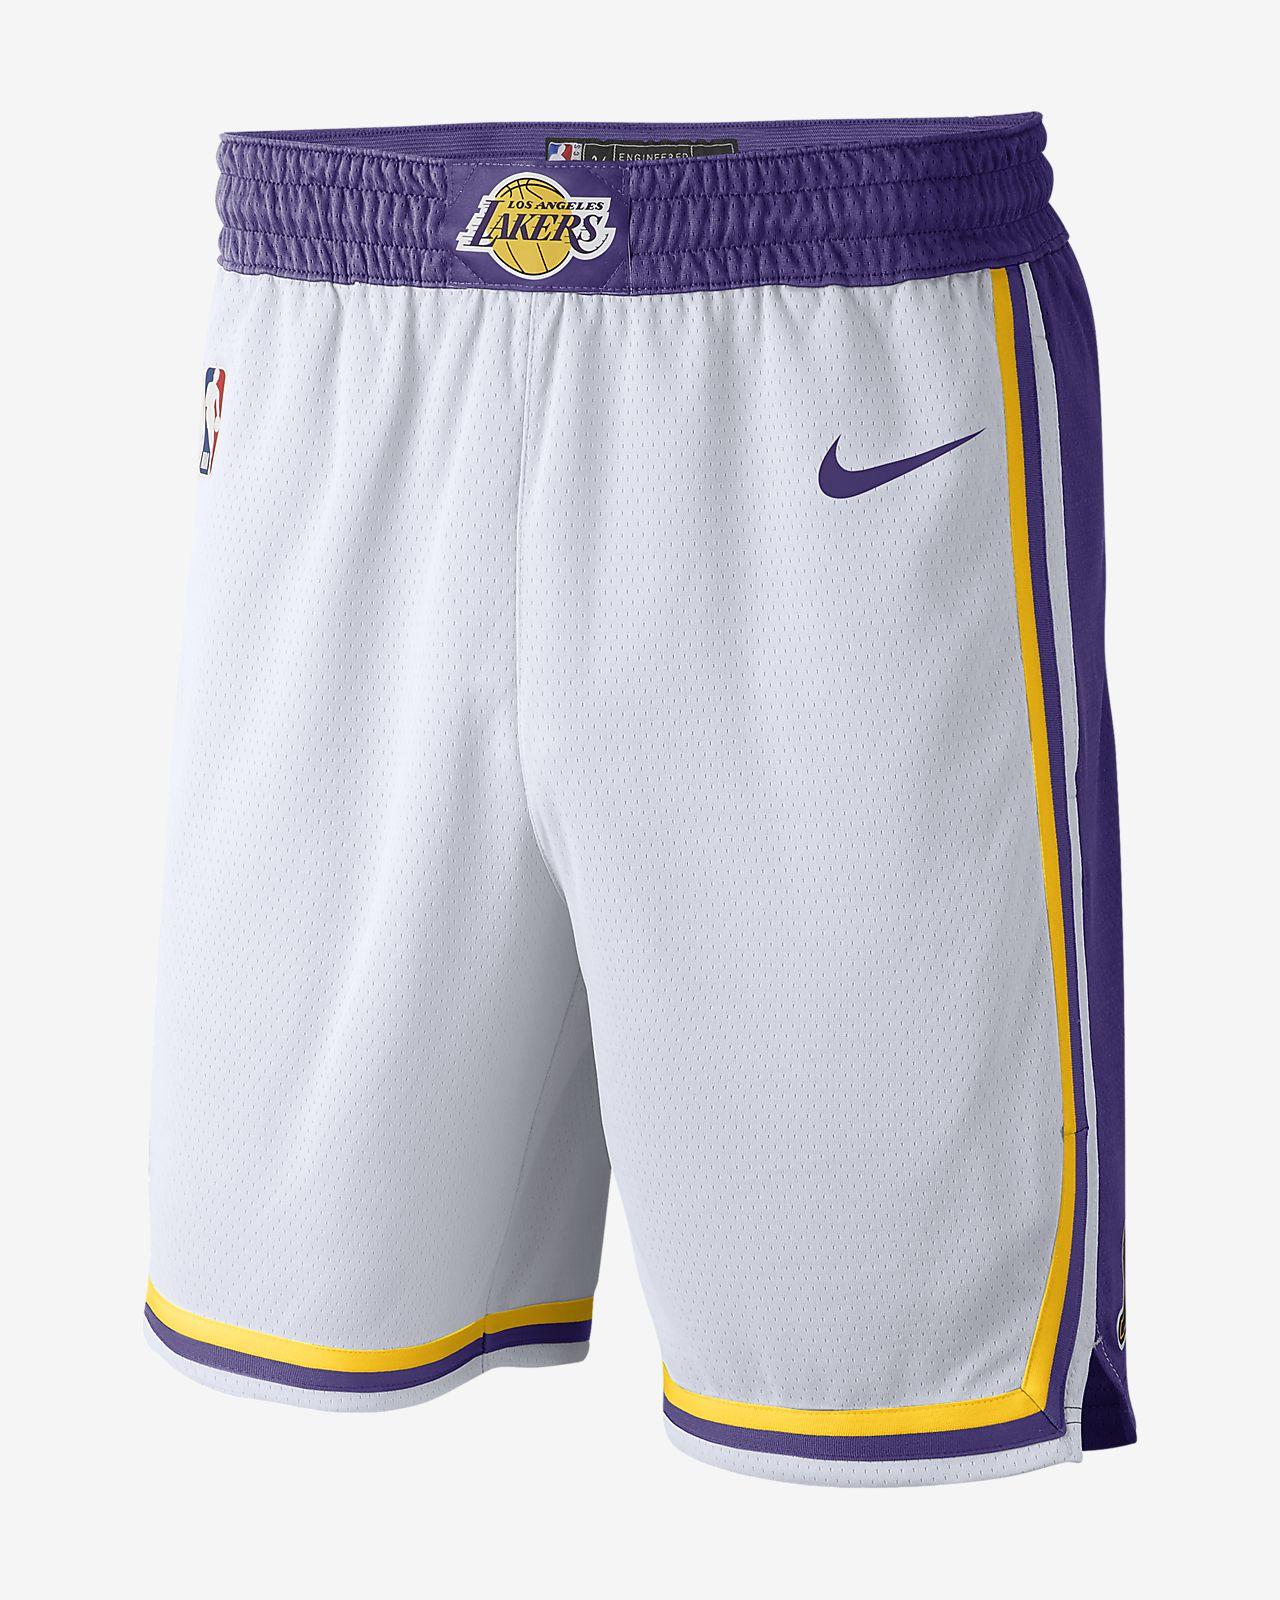 洛杉矶湖人队 Association Edition Swingman NikeNBA 男子短裤